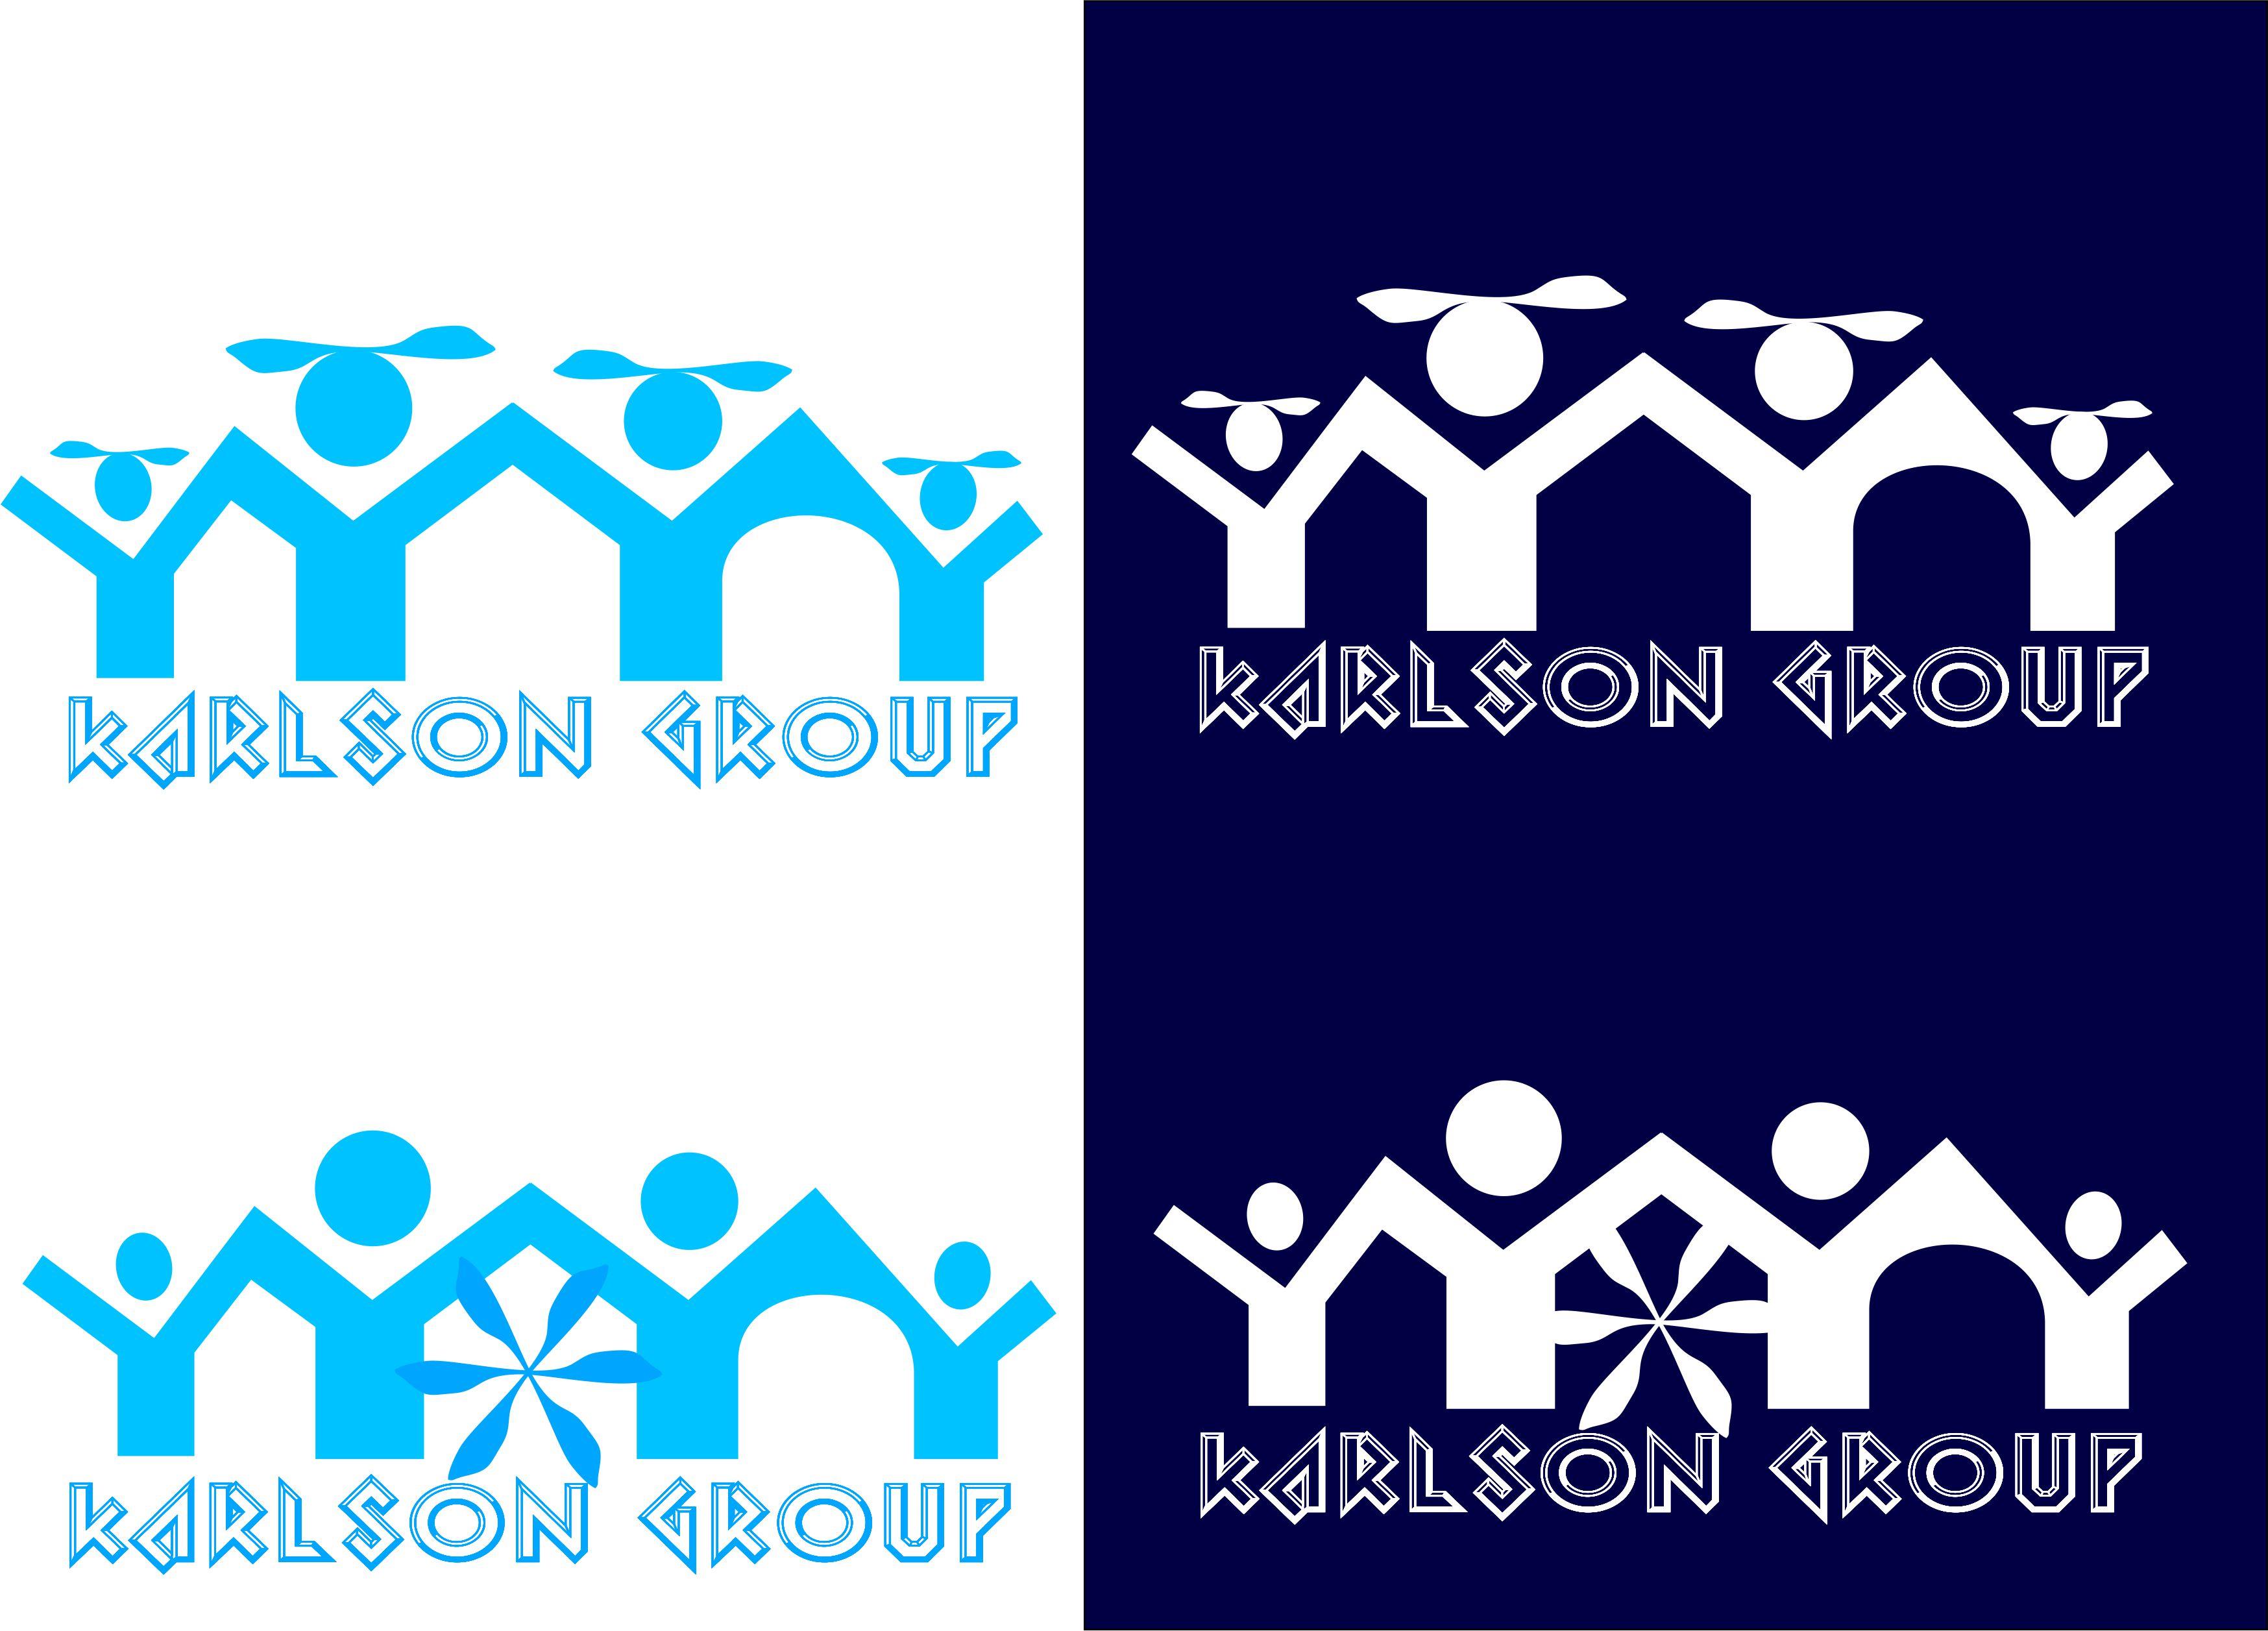 Придумать классный логотип фото f_590598a0b37445ab.jpg